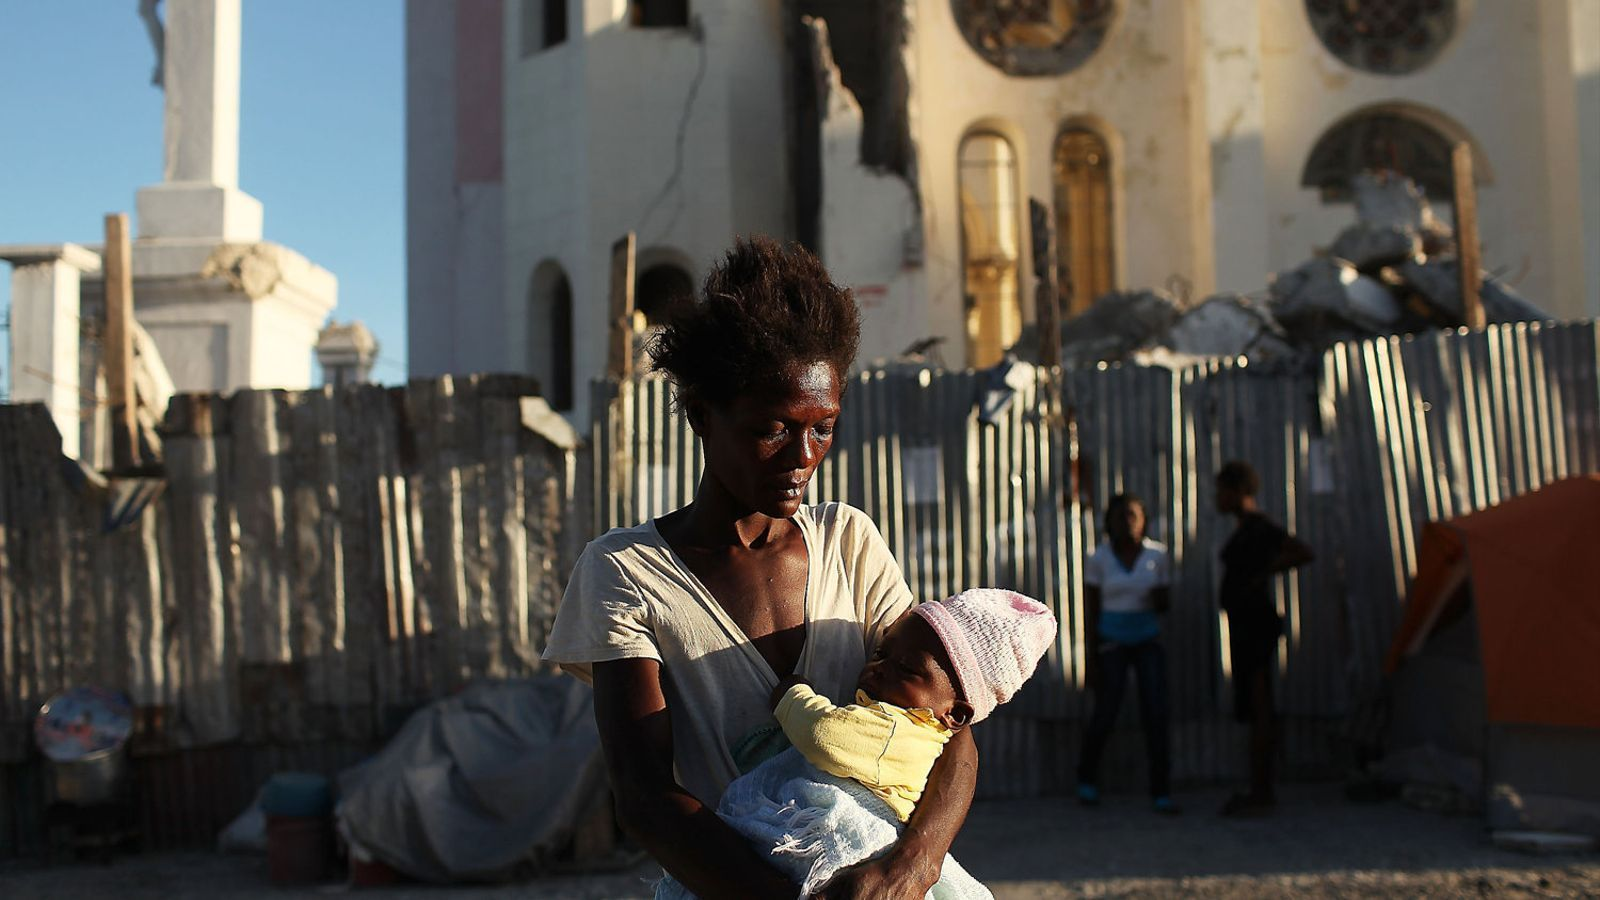 Directius d'Oxfam van contractar prostitutes a Haití